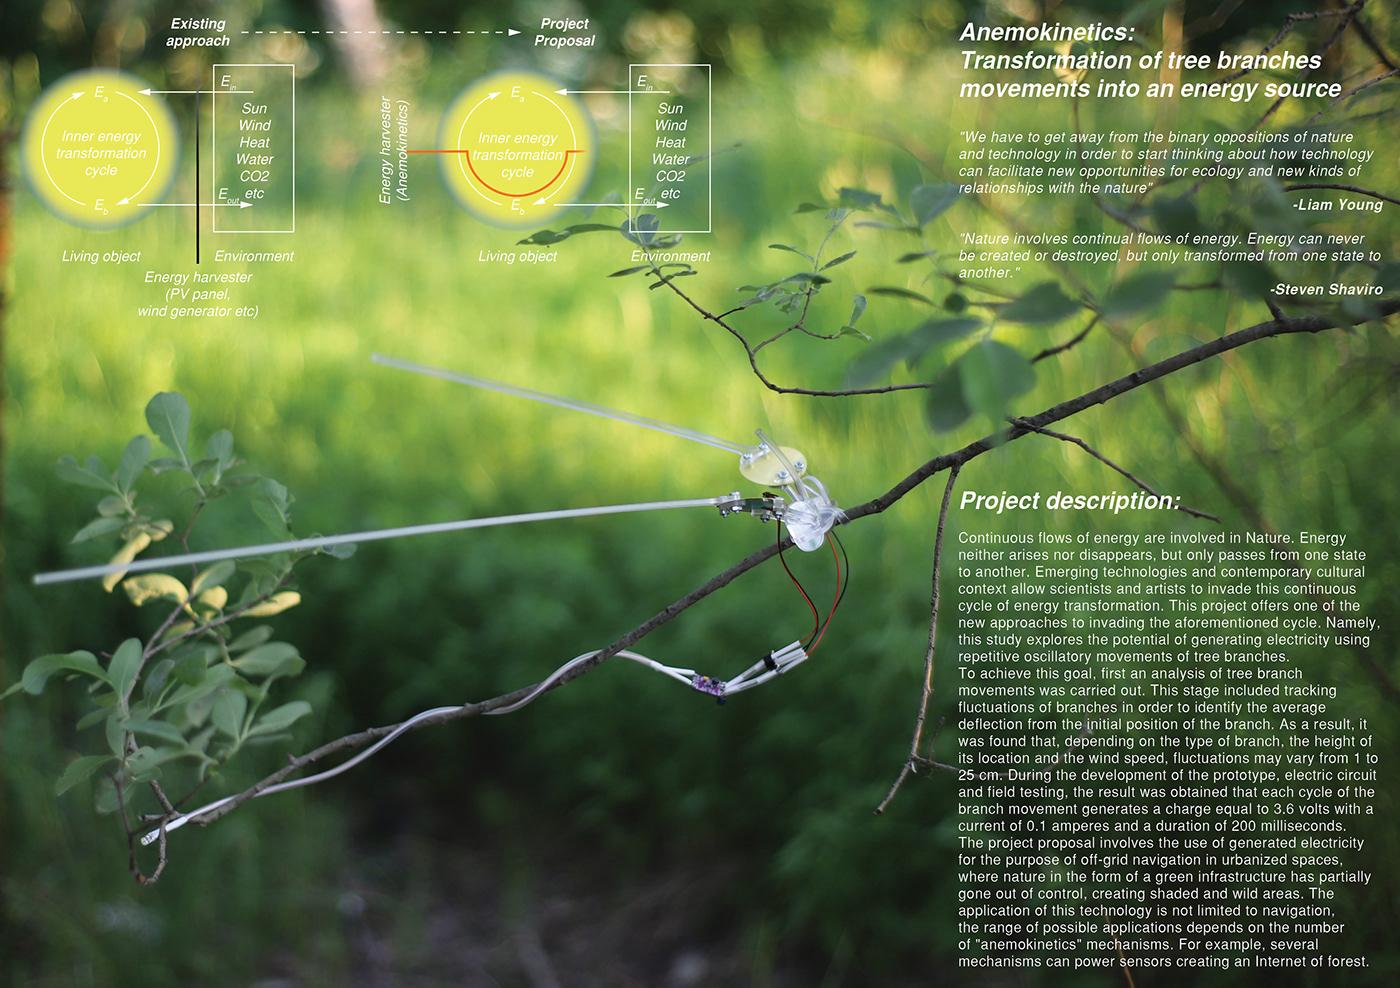 Nature design Technology anthropocene prototype interaction Tree  movements anemokinetics